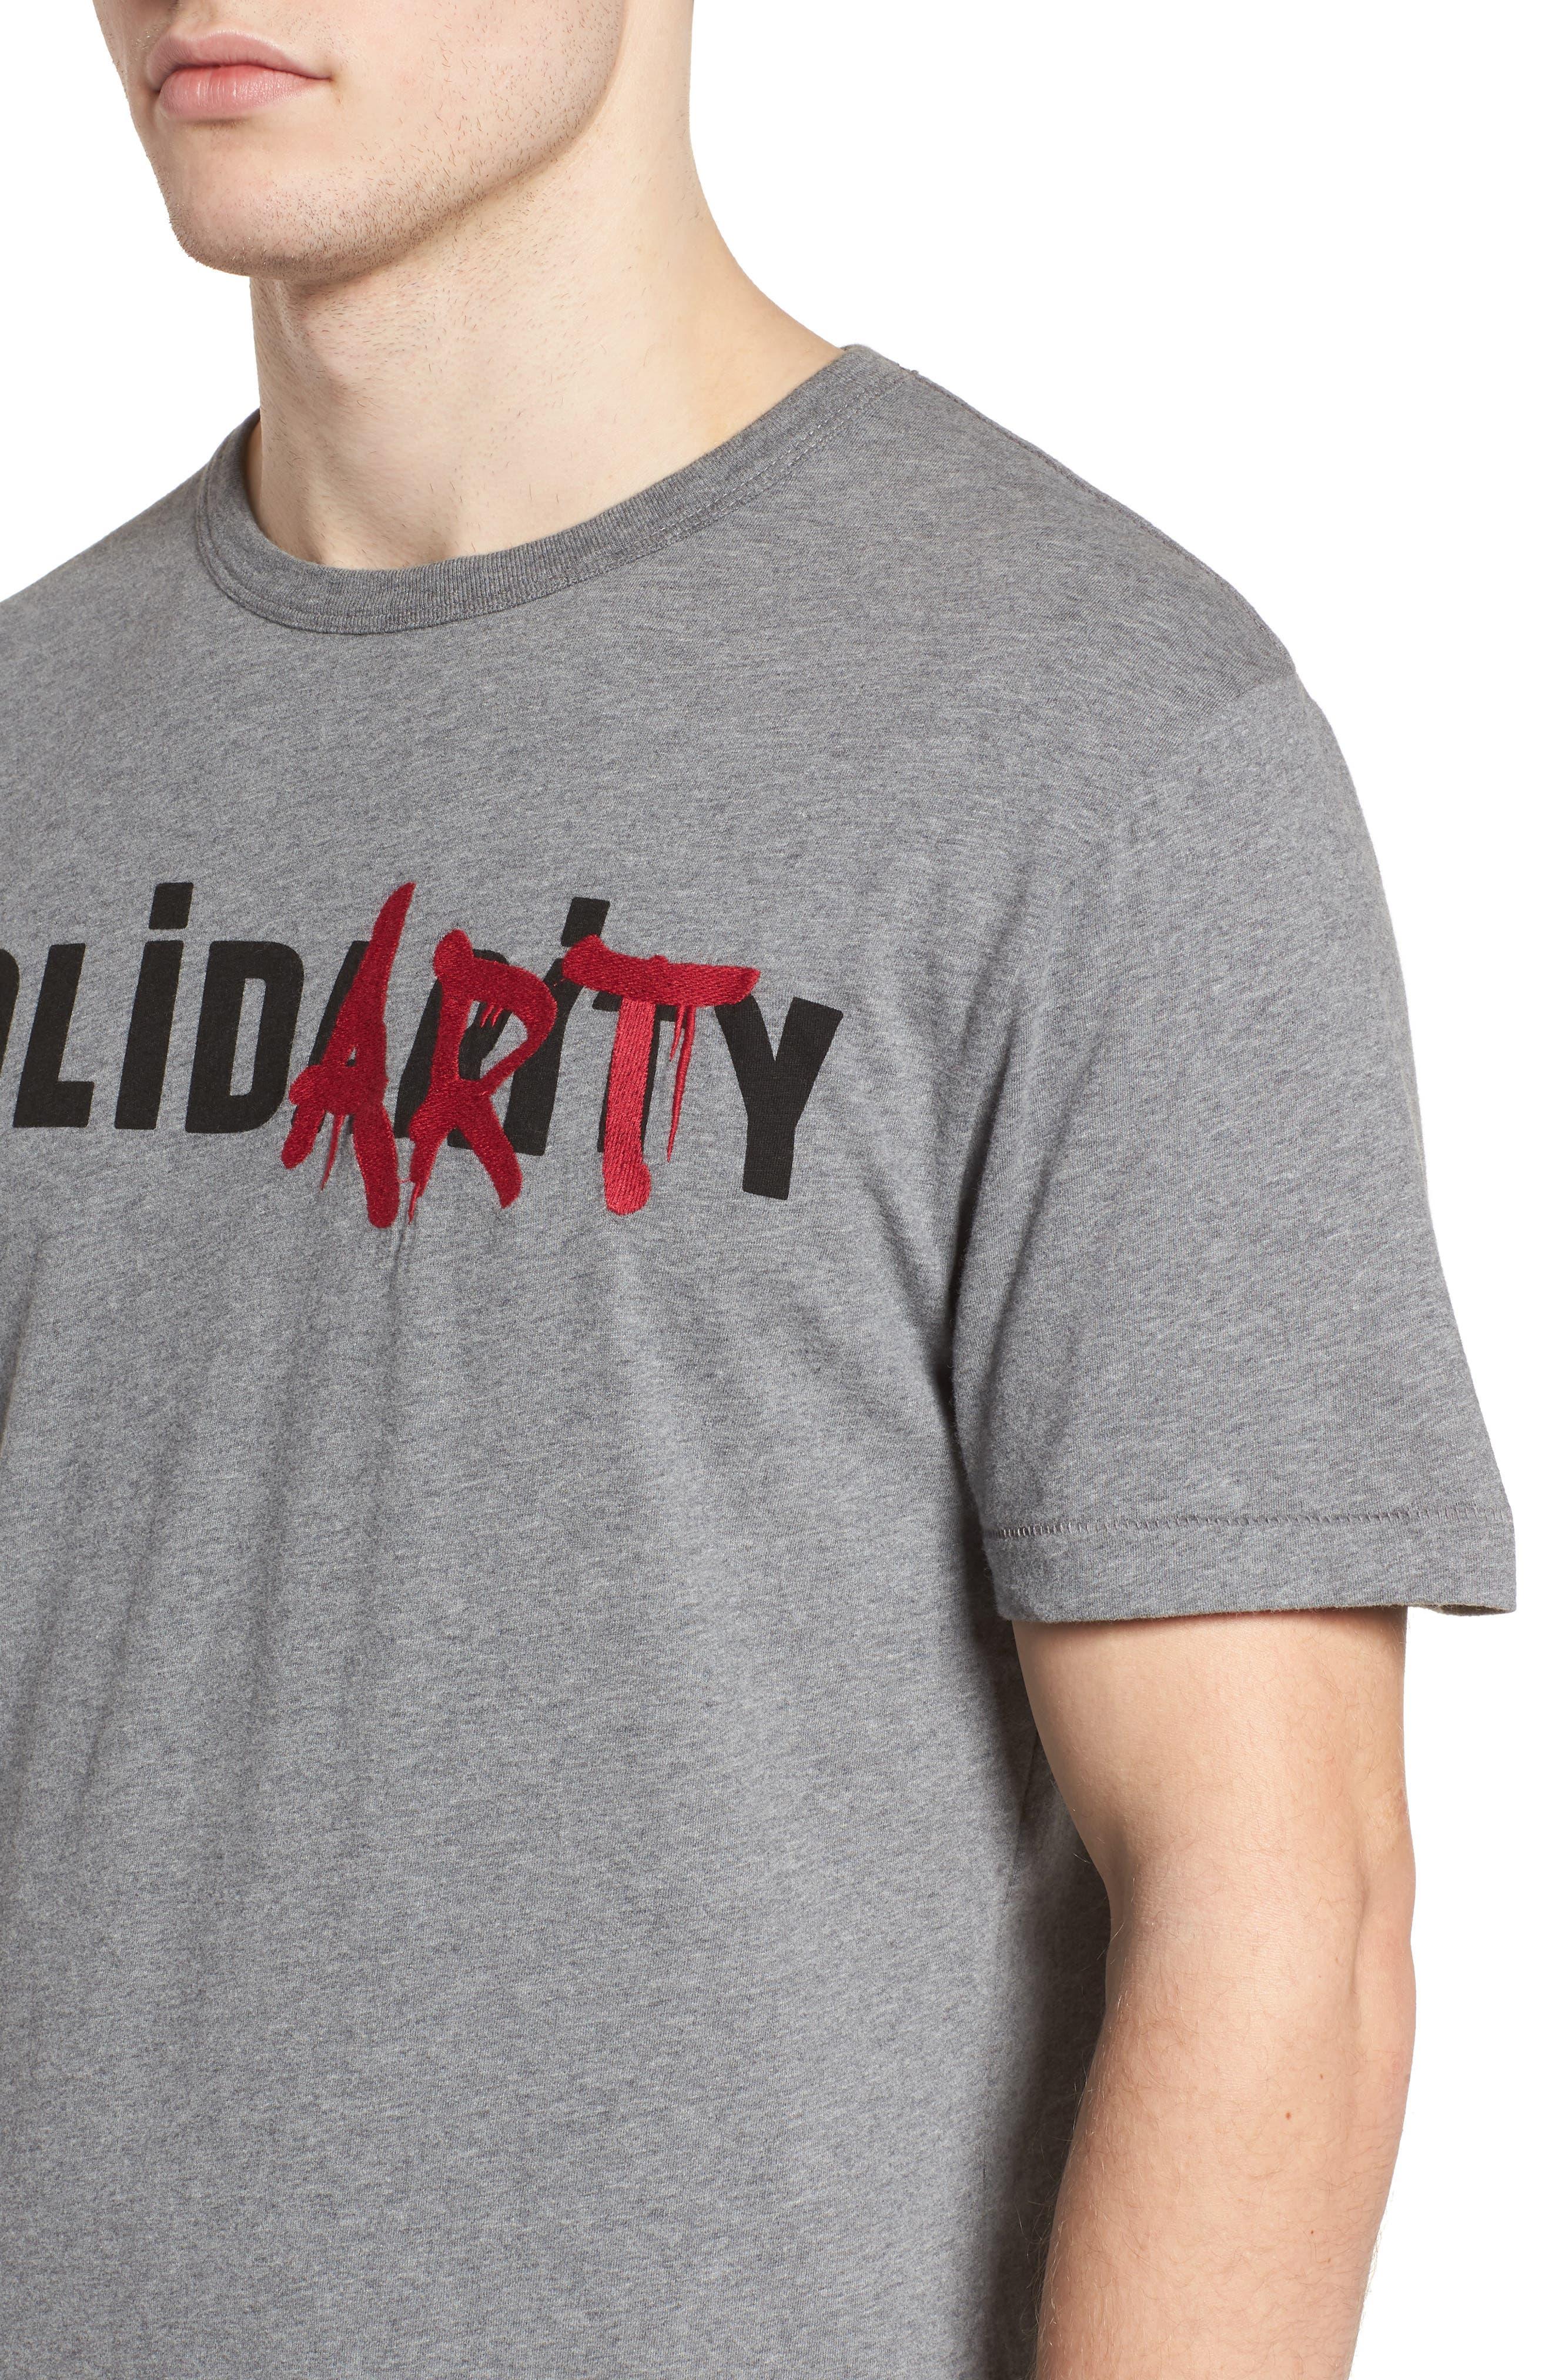 Solidarity Slim Fit Crewneck T-Shirt,                             Alternate thumbnail 4, color,                             Mid Grey Melange/ Black